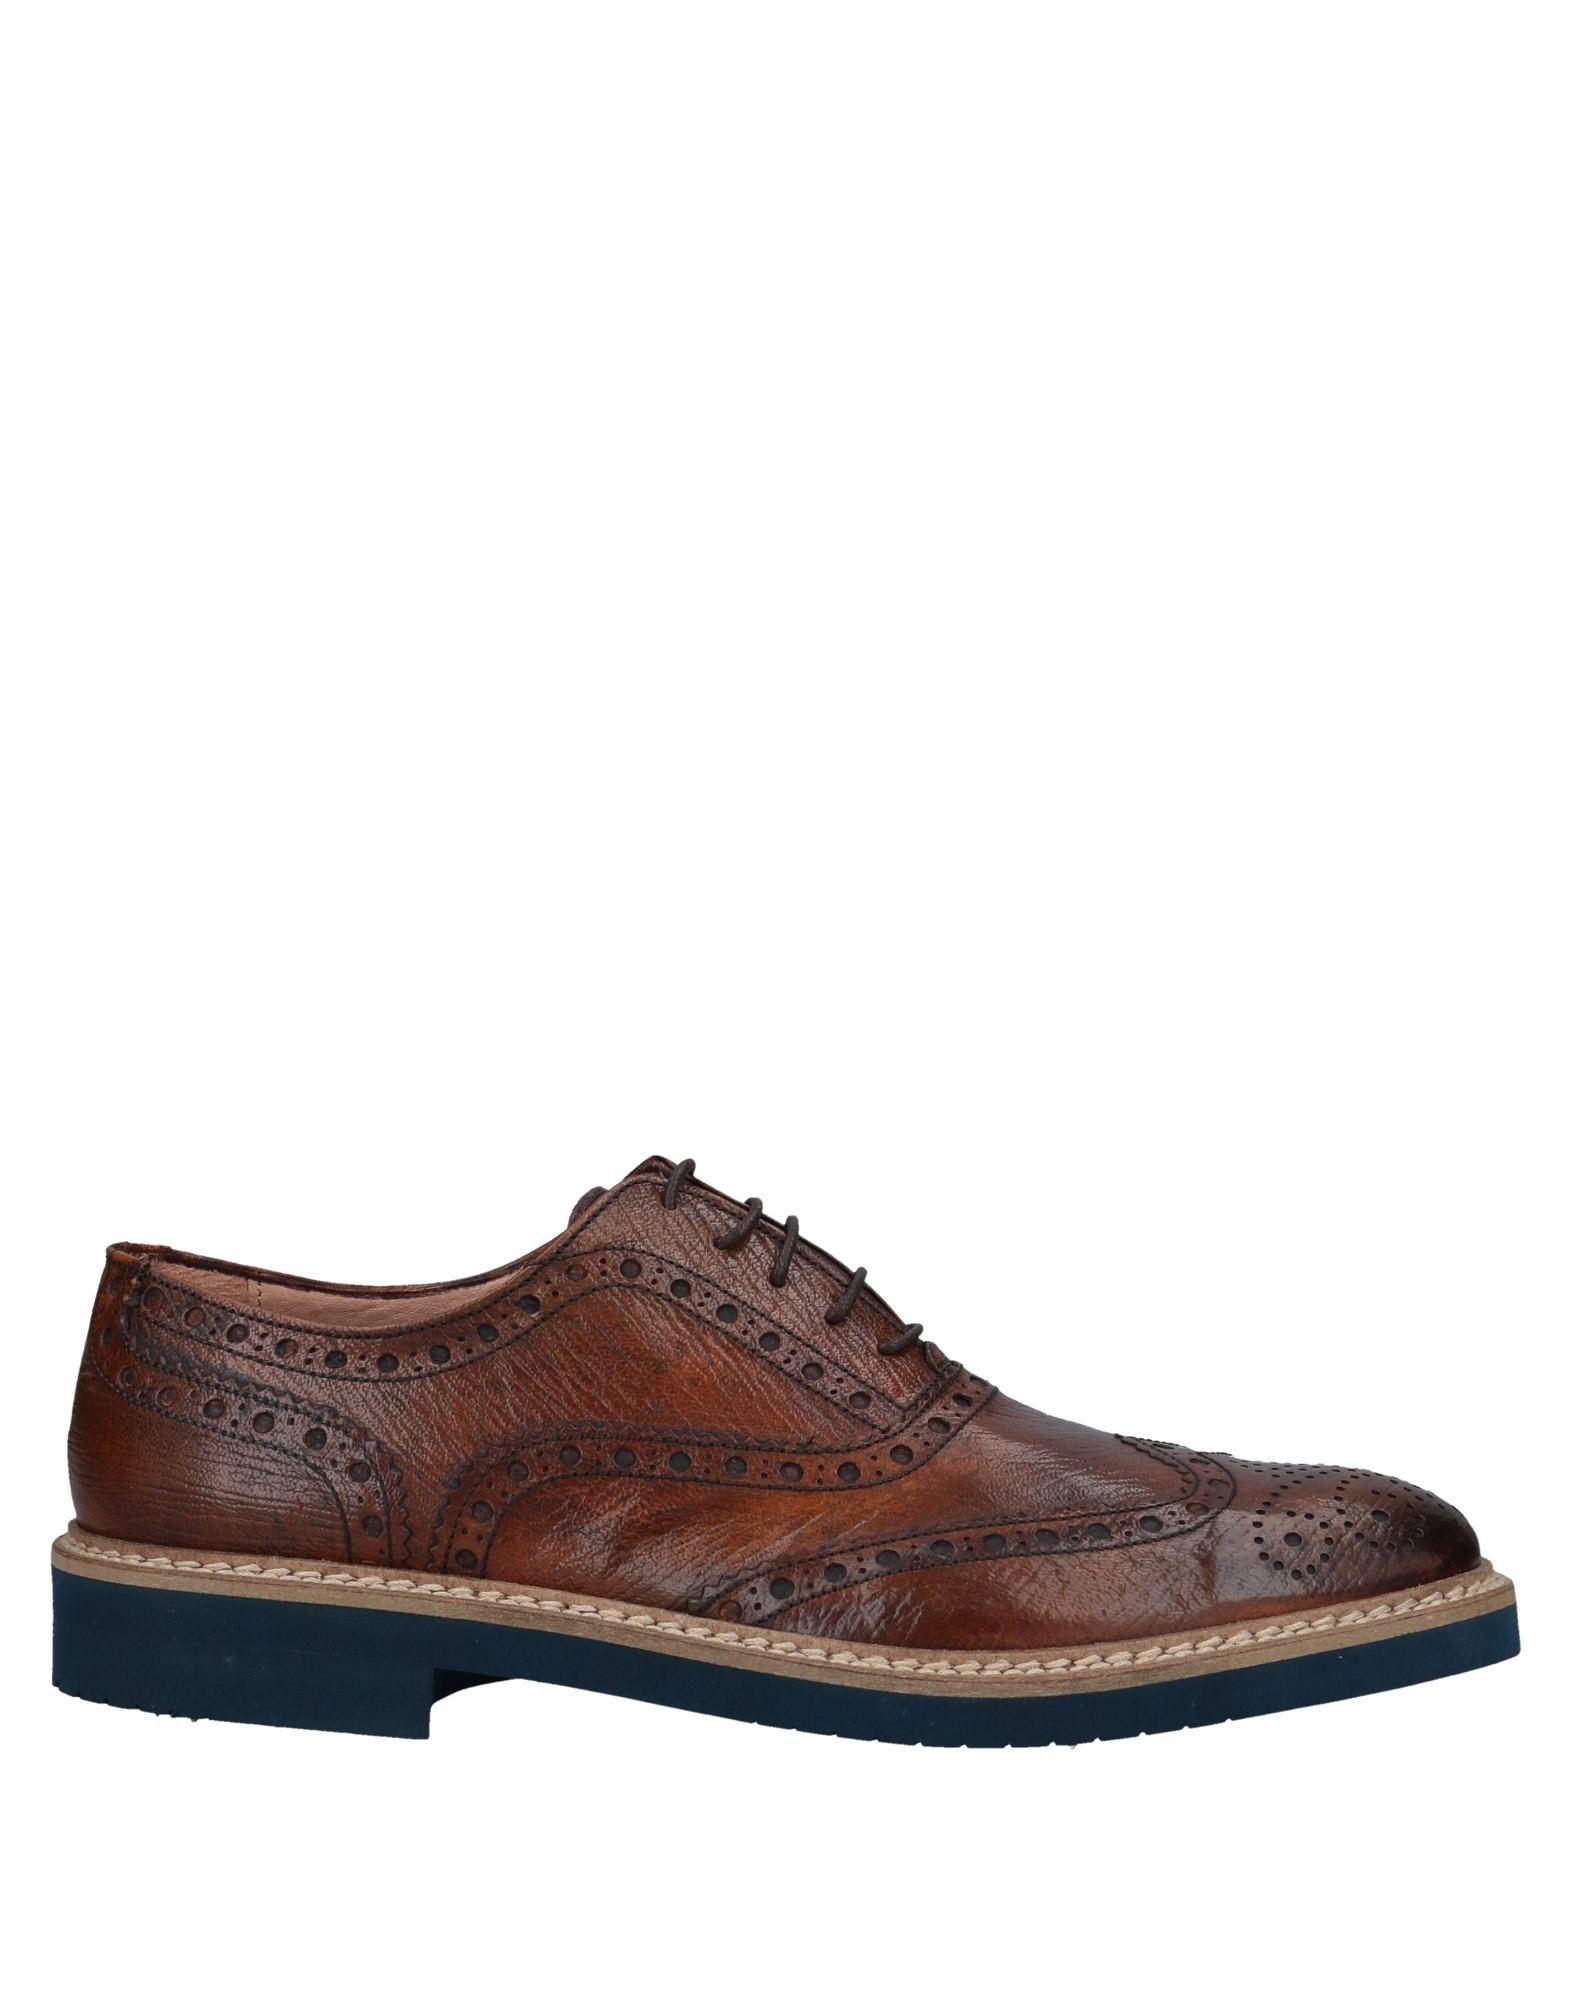 Фото - BALDININI Обувь на шнурках обувь на высокой платформе dkny